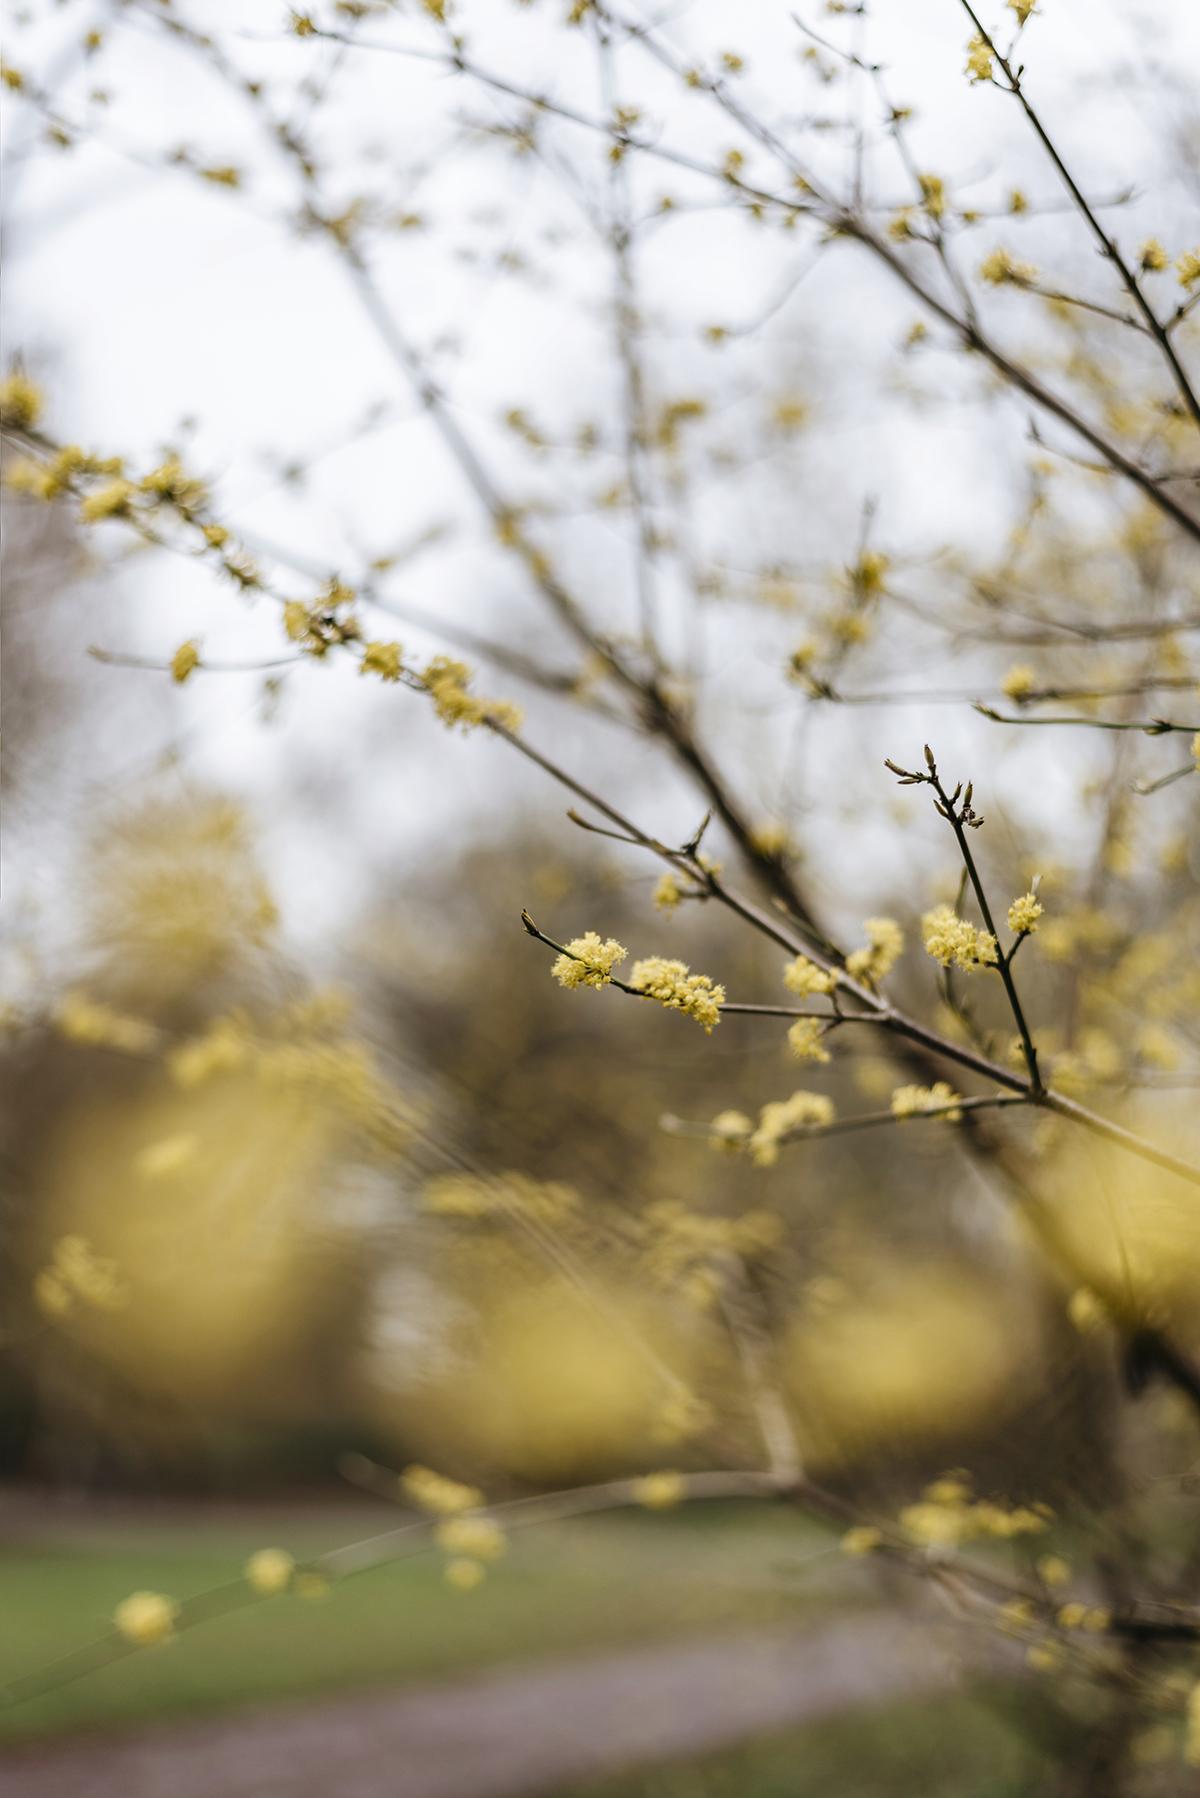 yellow-spring-blossom-spicebush-benjaminbush-patricia-martins-yellowish-2019